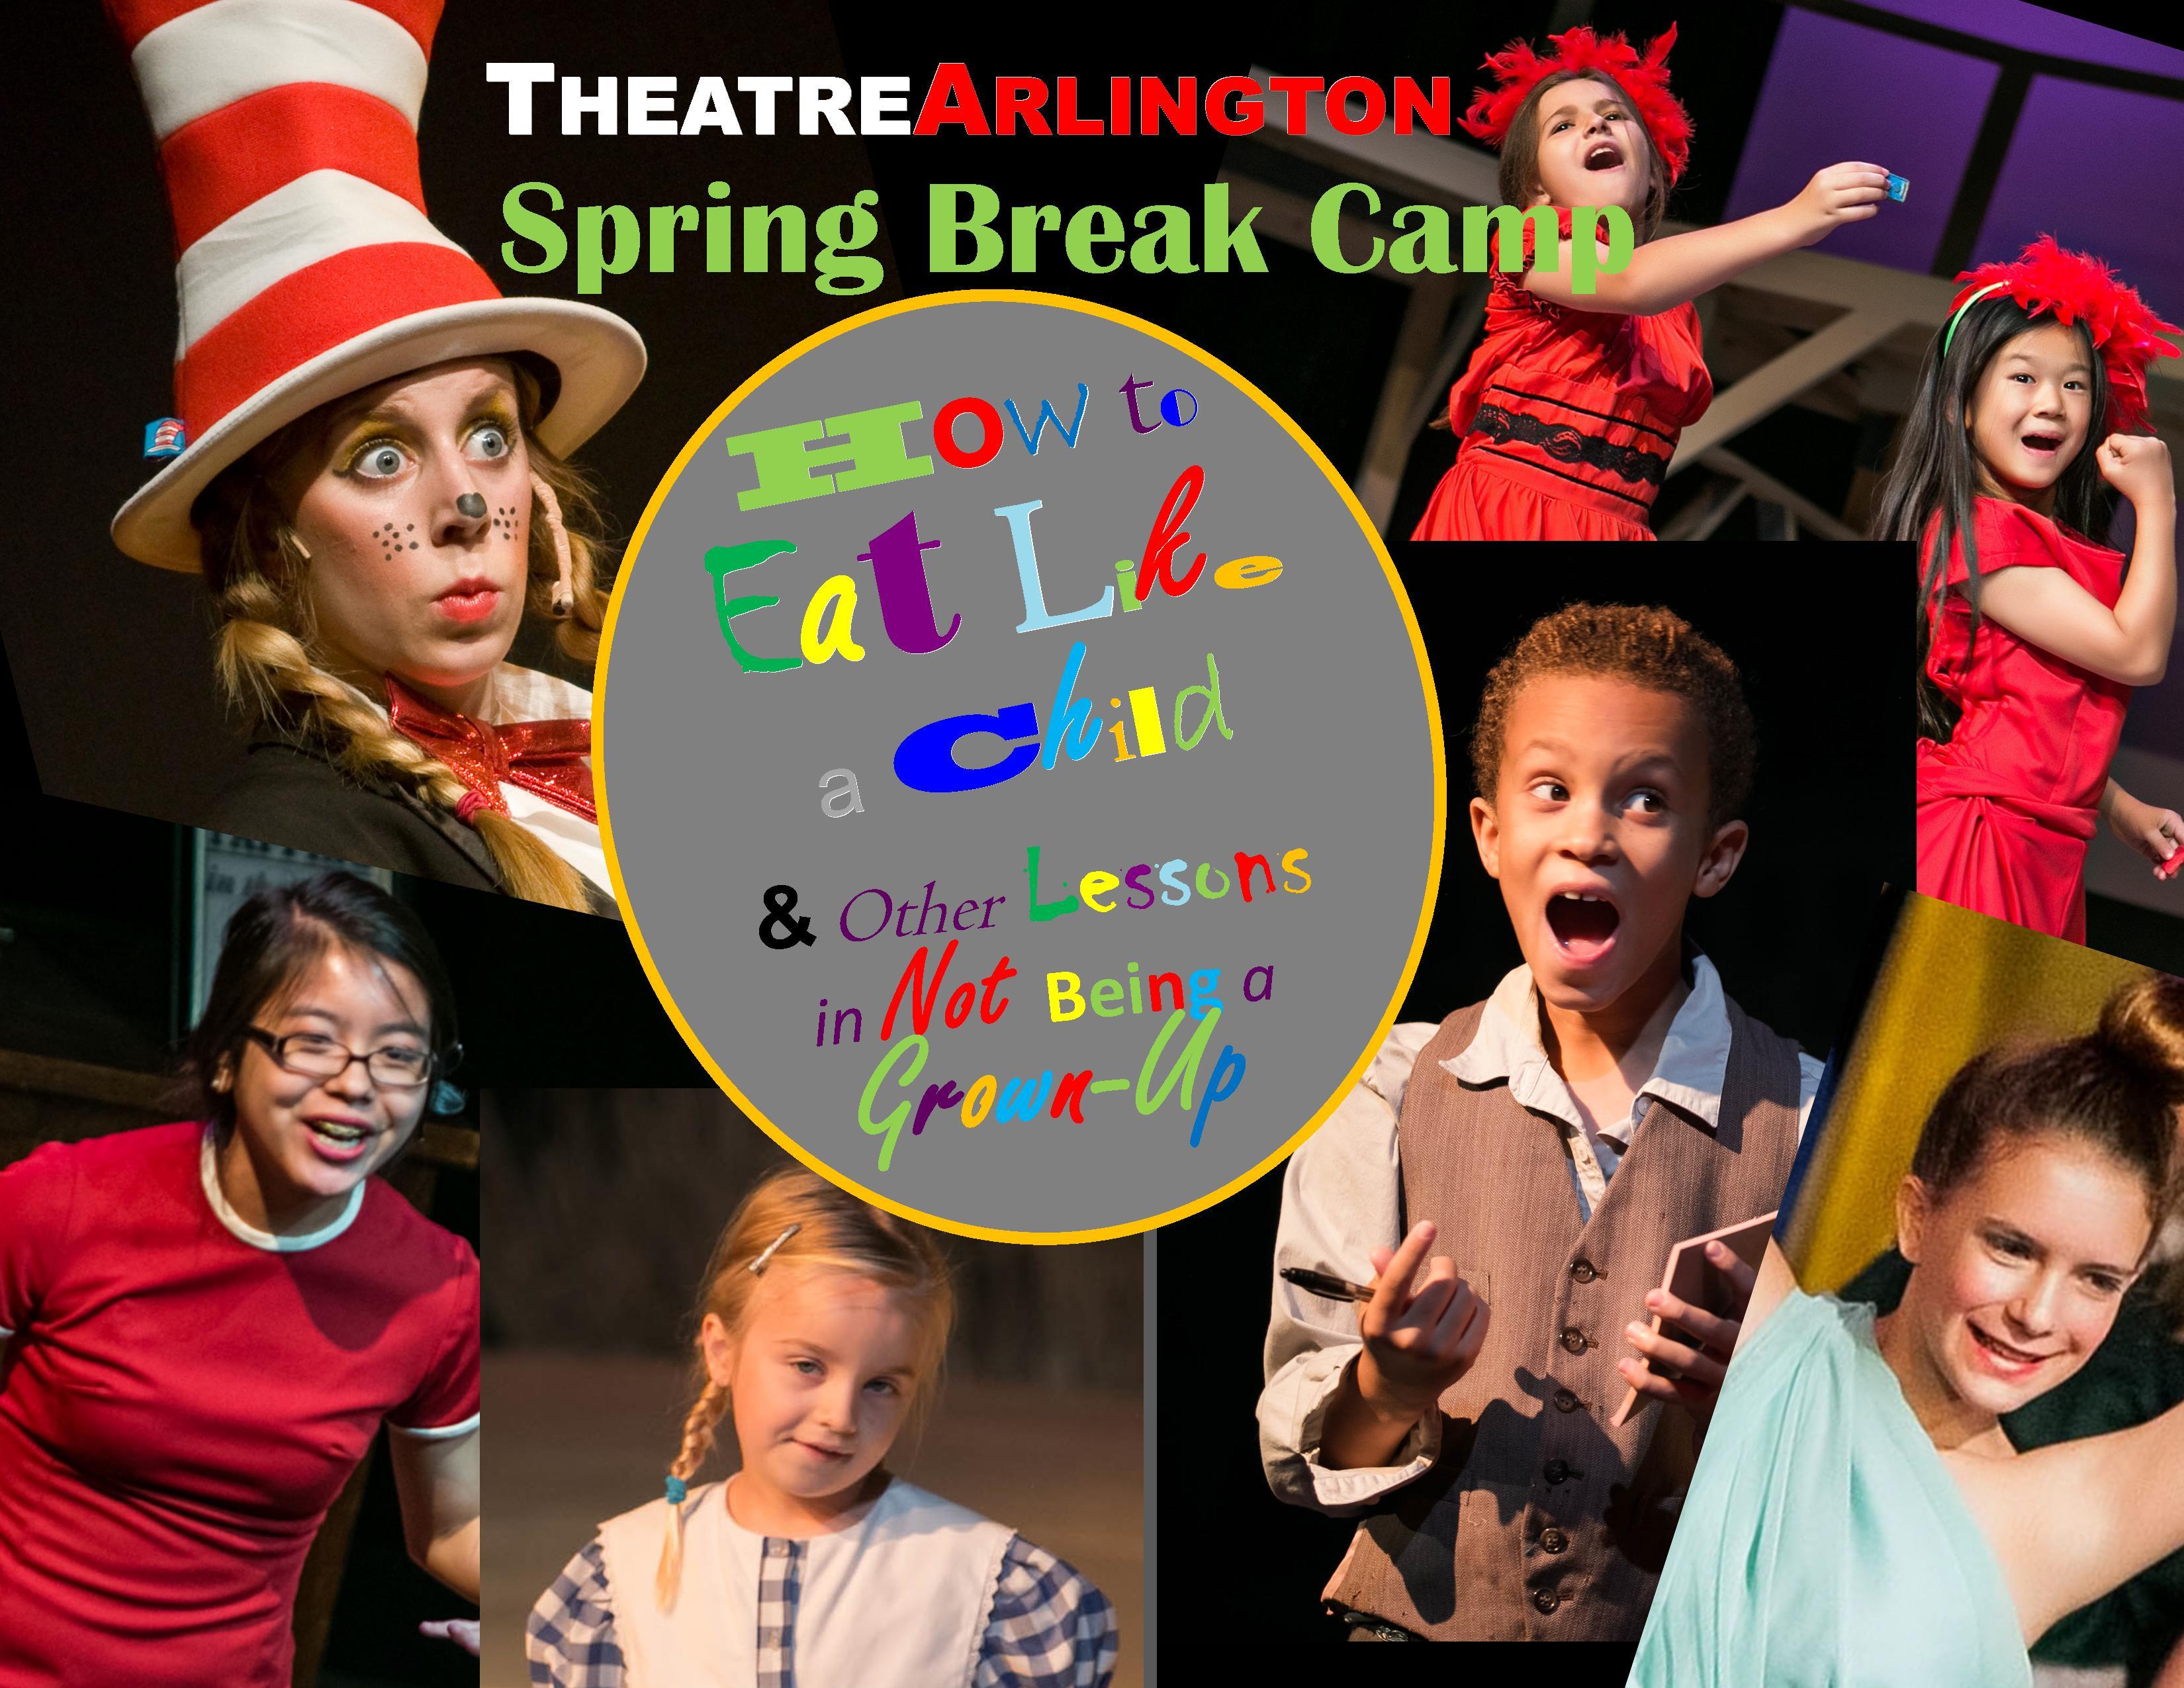 Theatre Arlington spring break camp